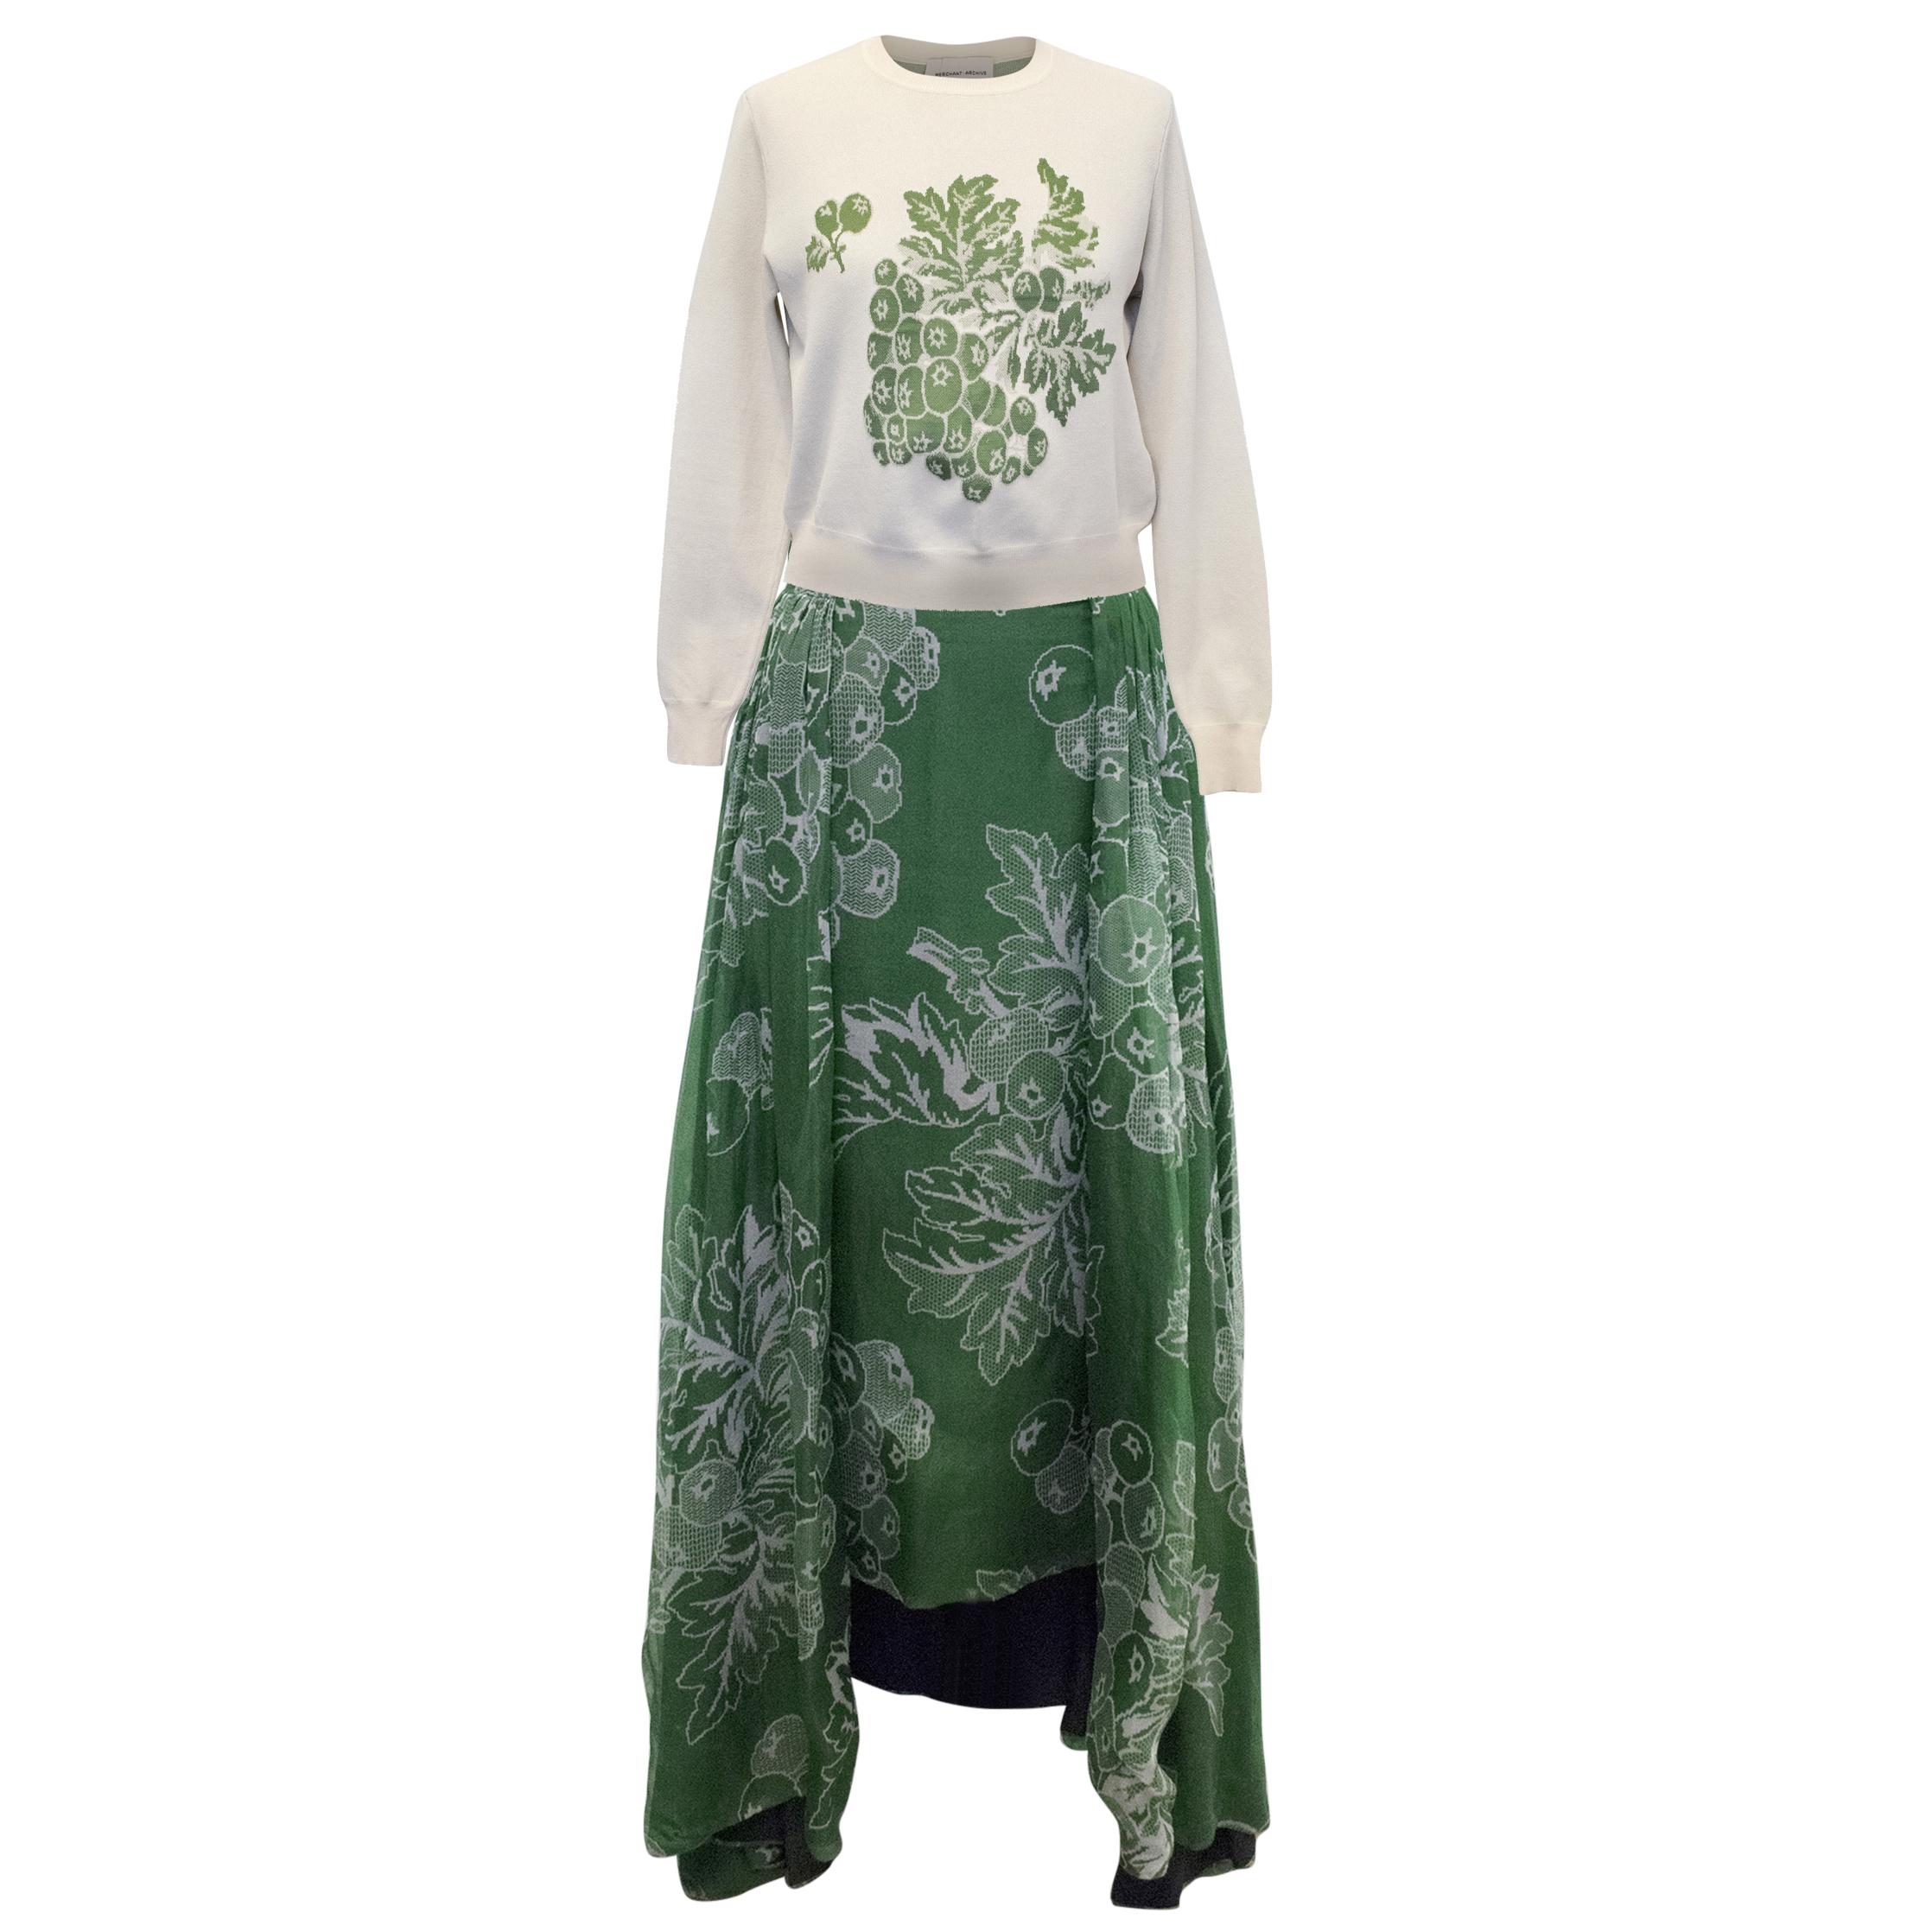 Merchant Archive Skirt and Jumper Set